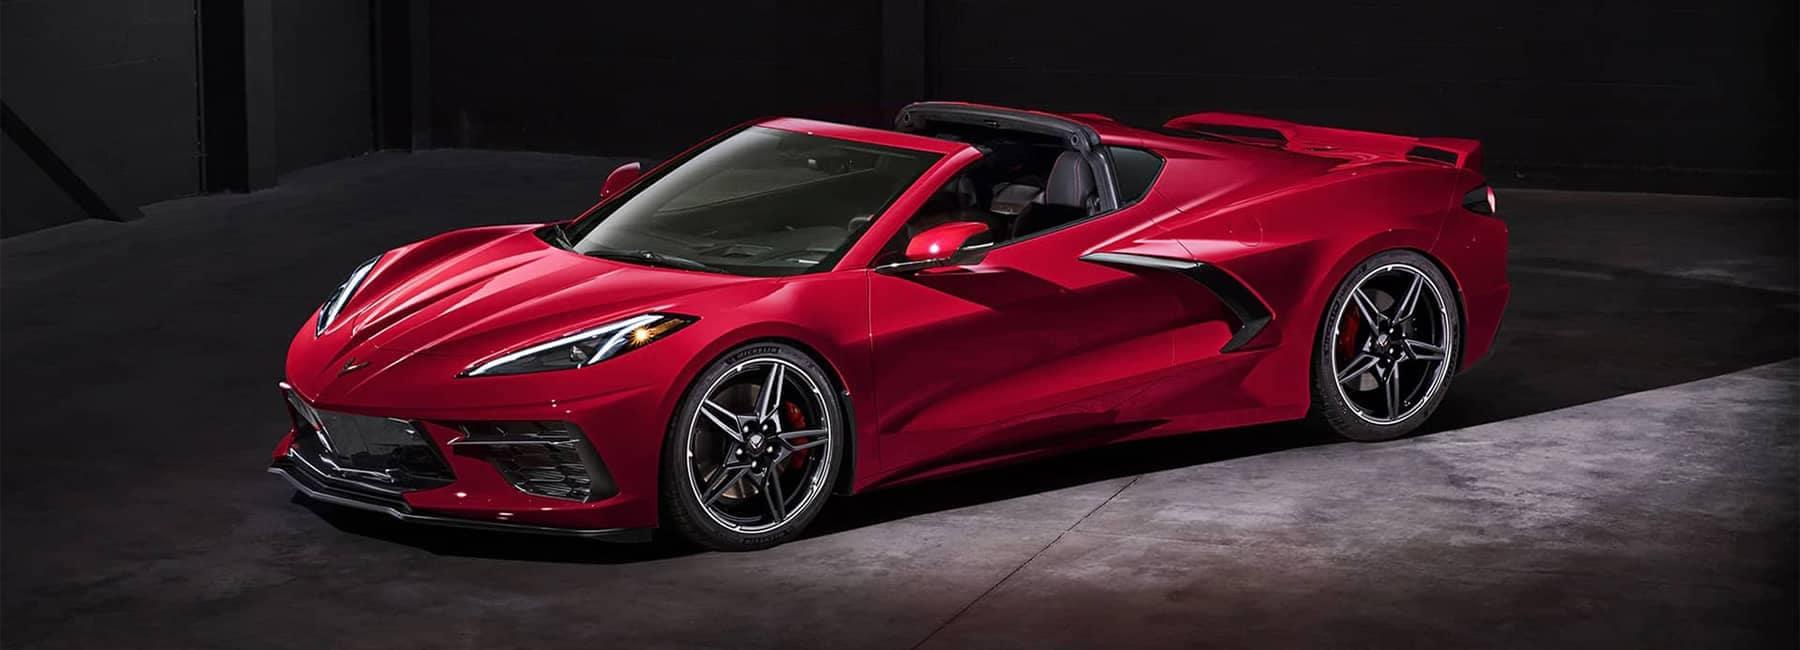 2020 Chevrolet Corvette Mid-Engine Sports Car convertible front side exterior